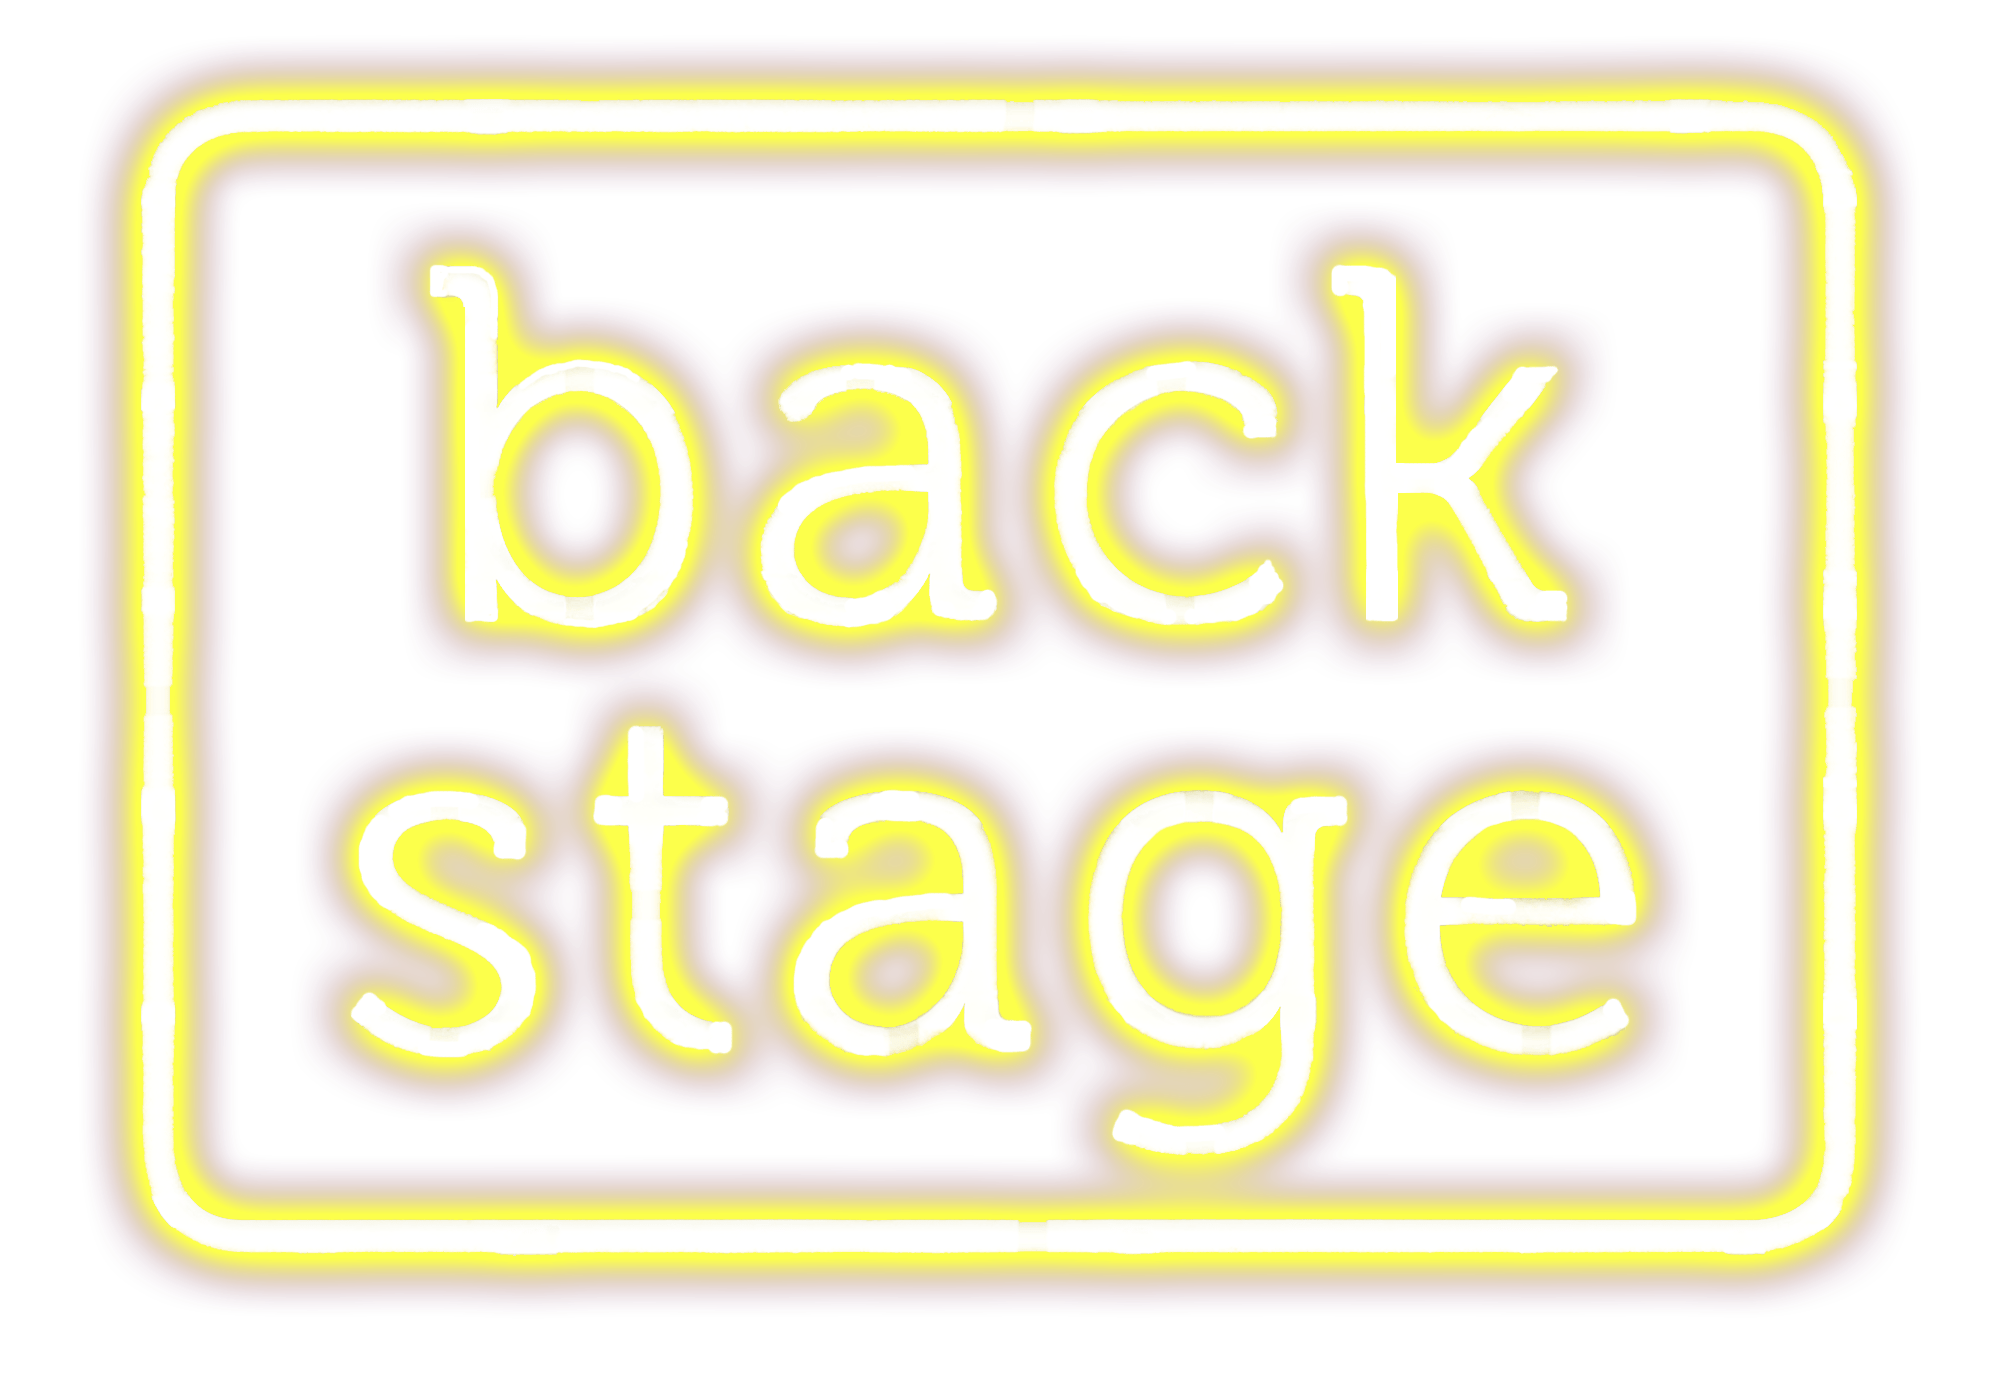 Backstage title